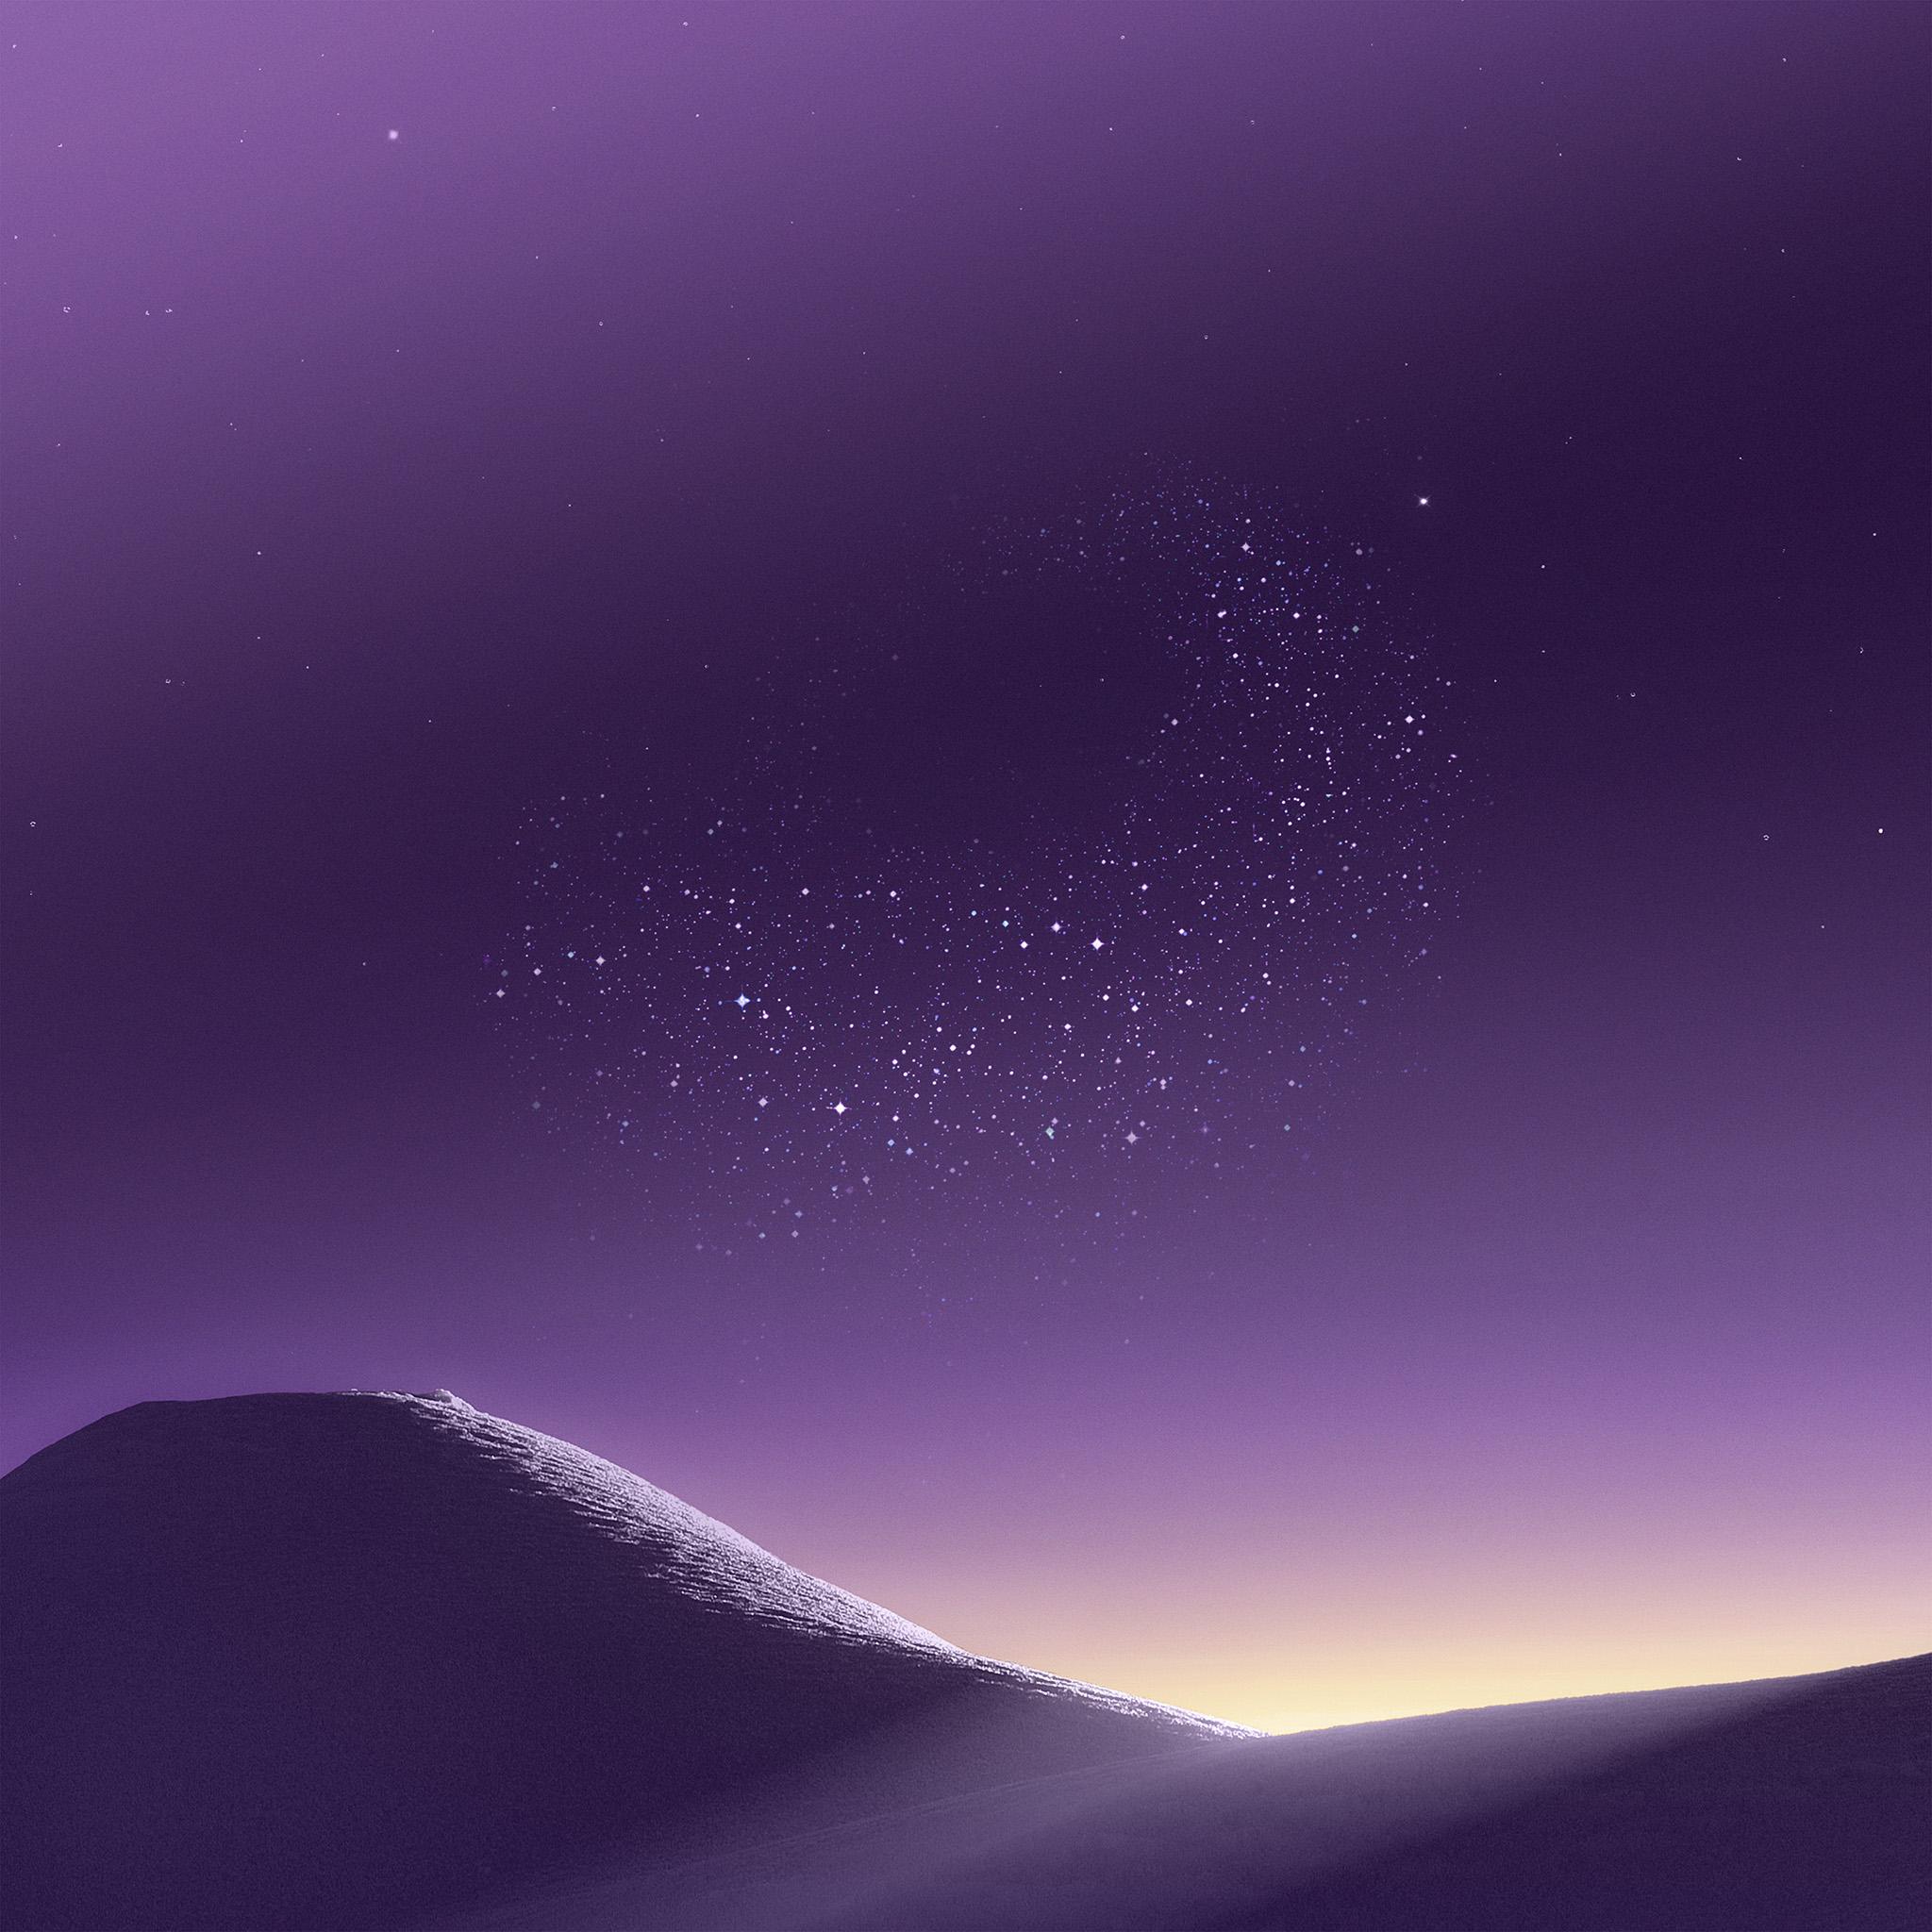 Vx20-galaxy-s8-purple